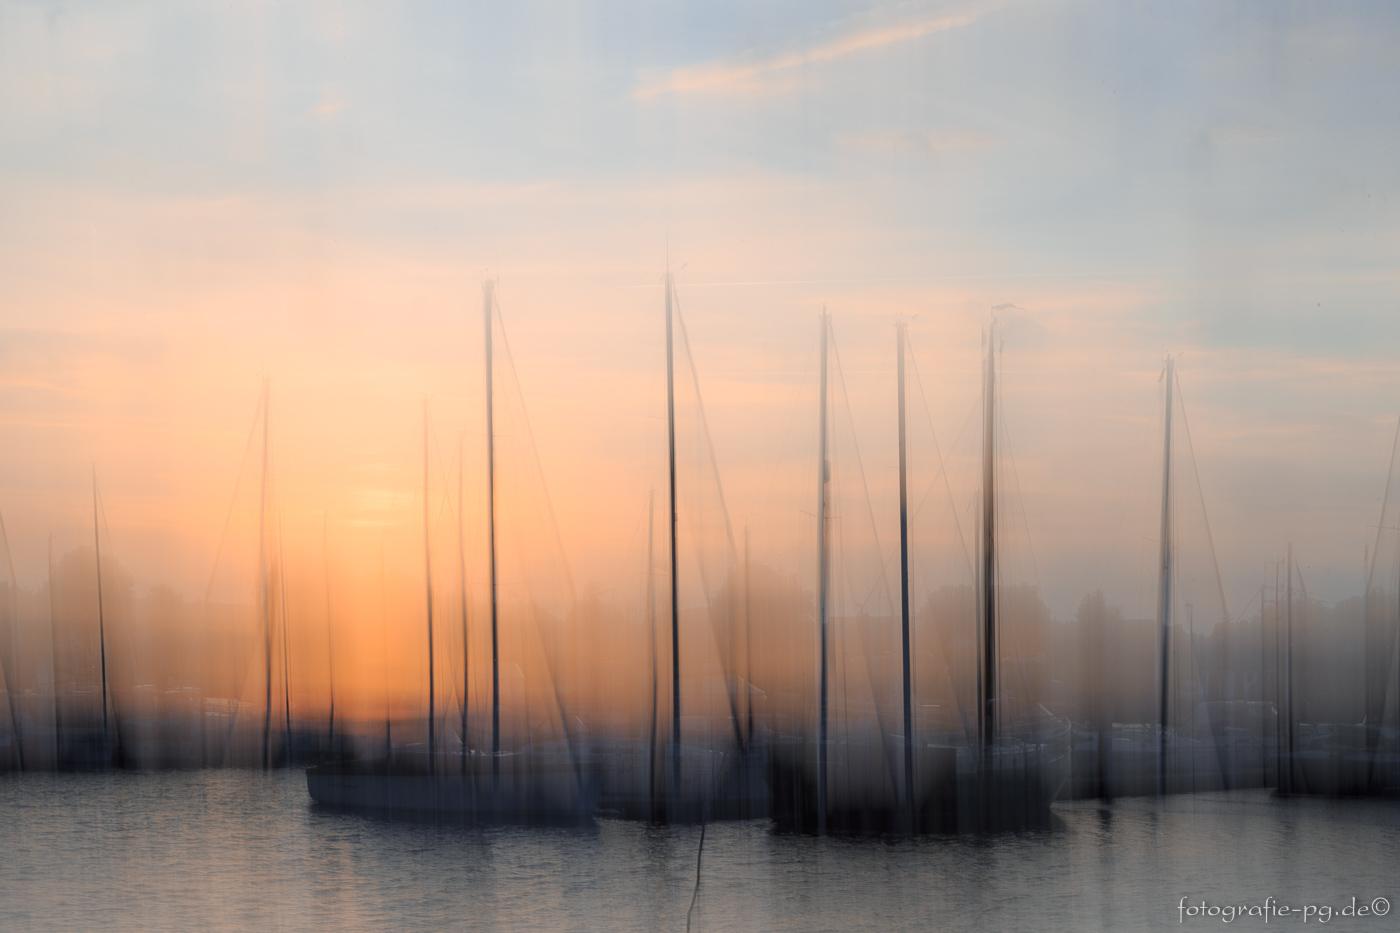 ... Yachthafen-Romantik ...